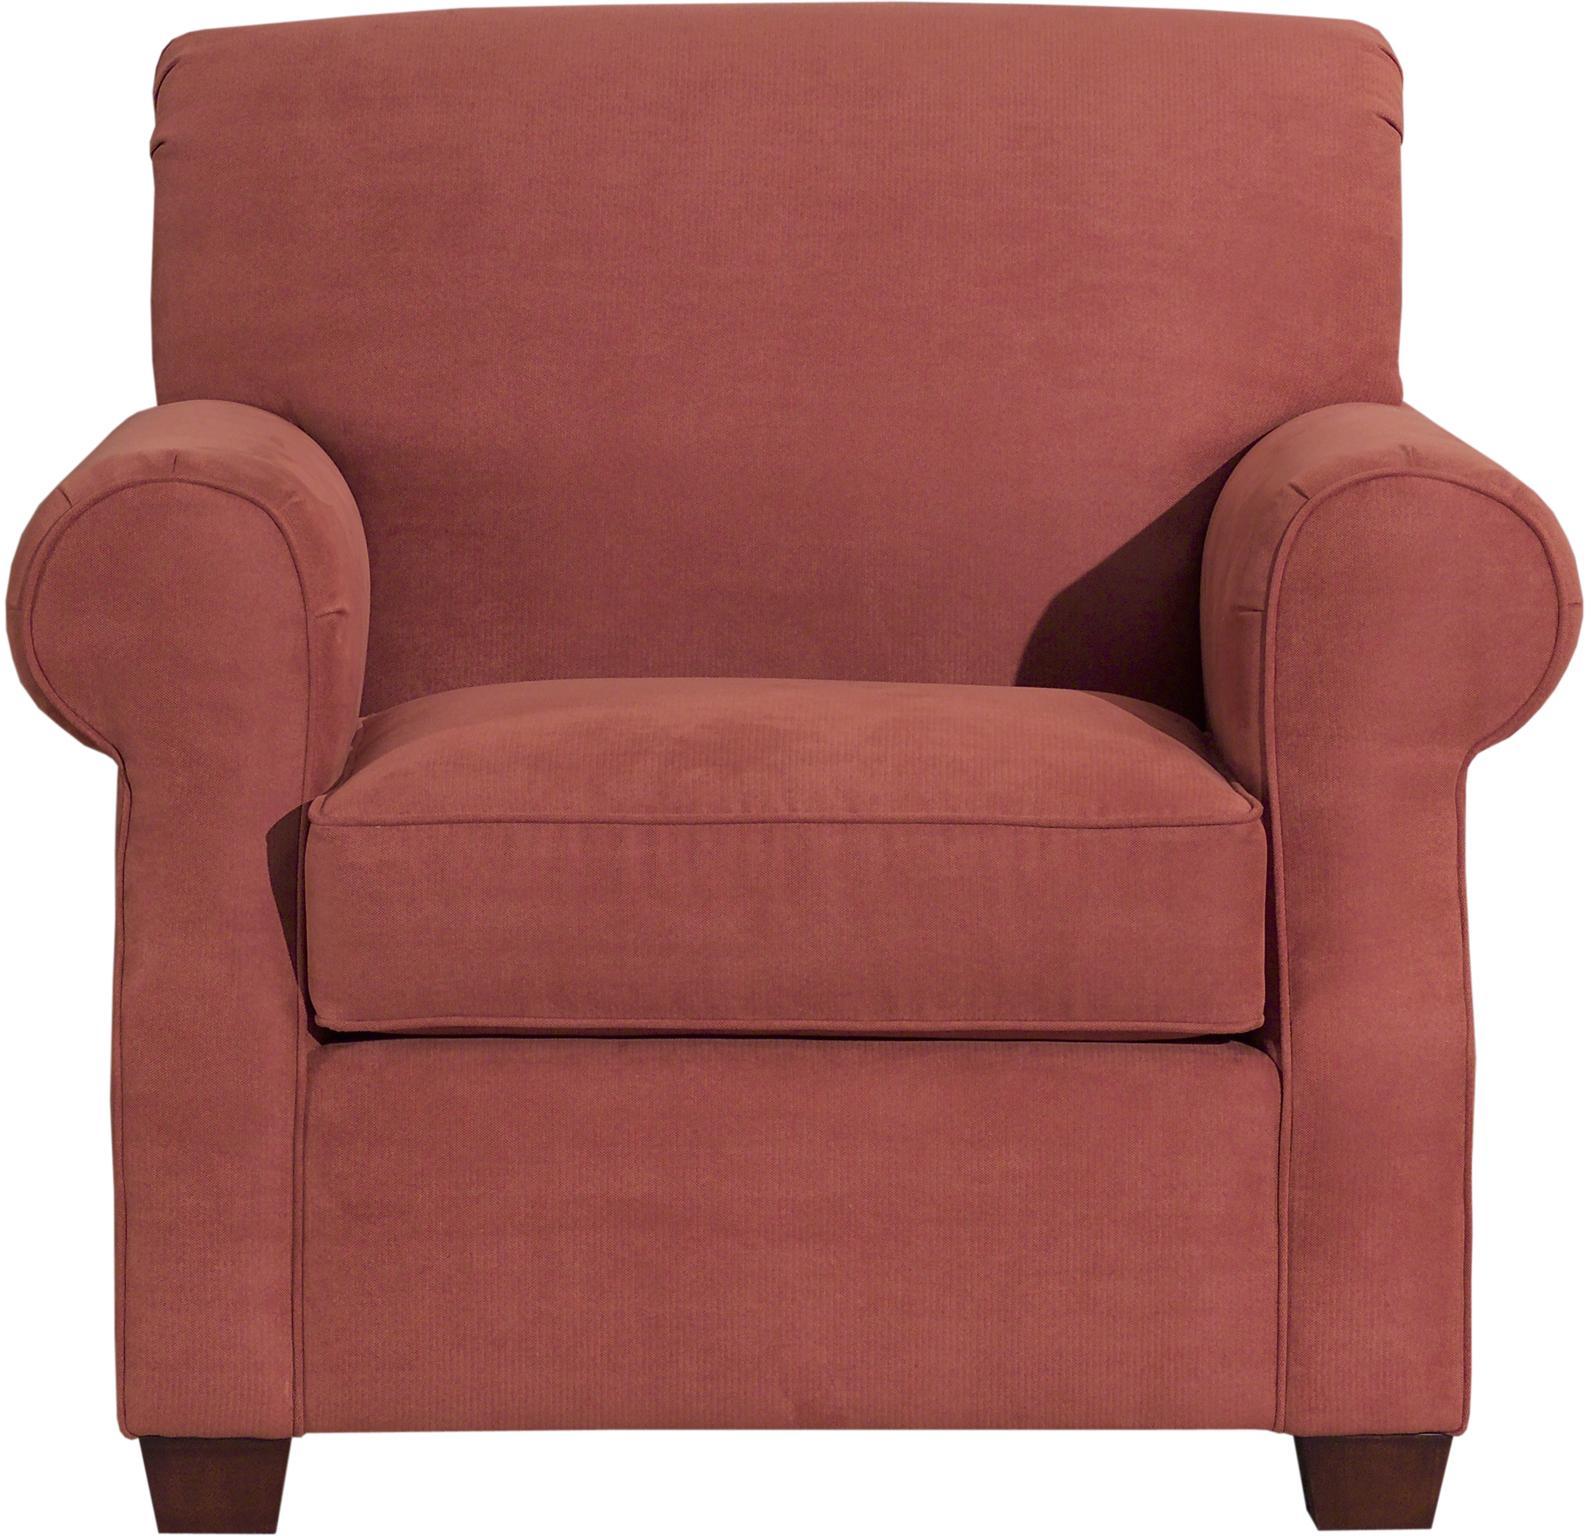 Lynchburg Chair by Kincaid Furniture at Johnny Janosik